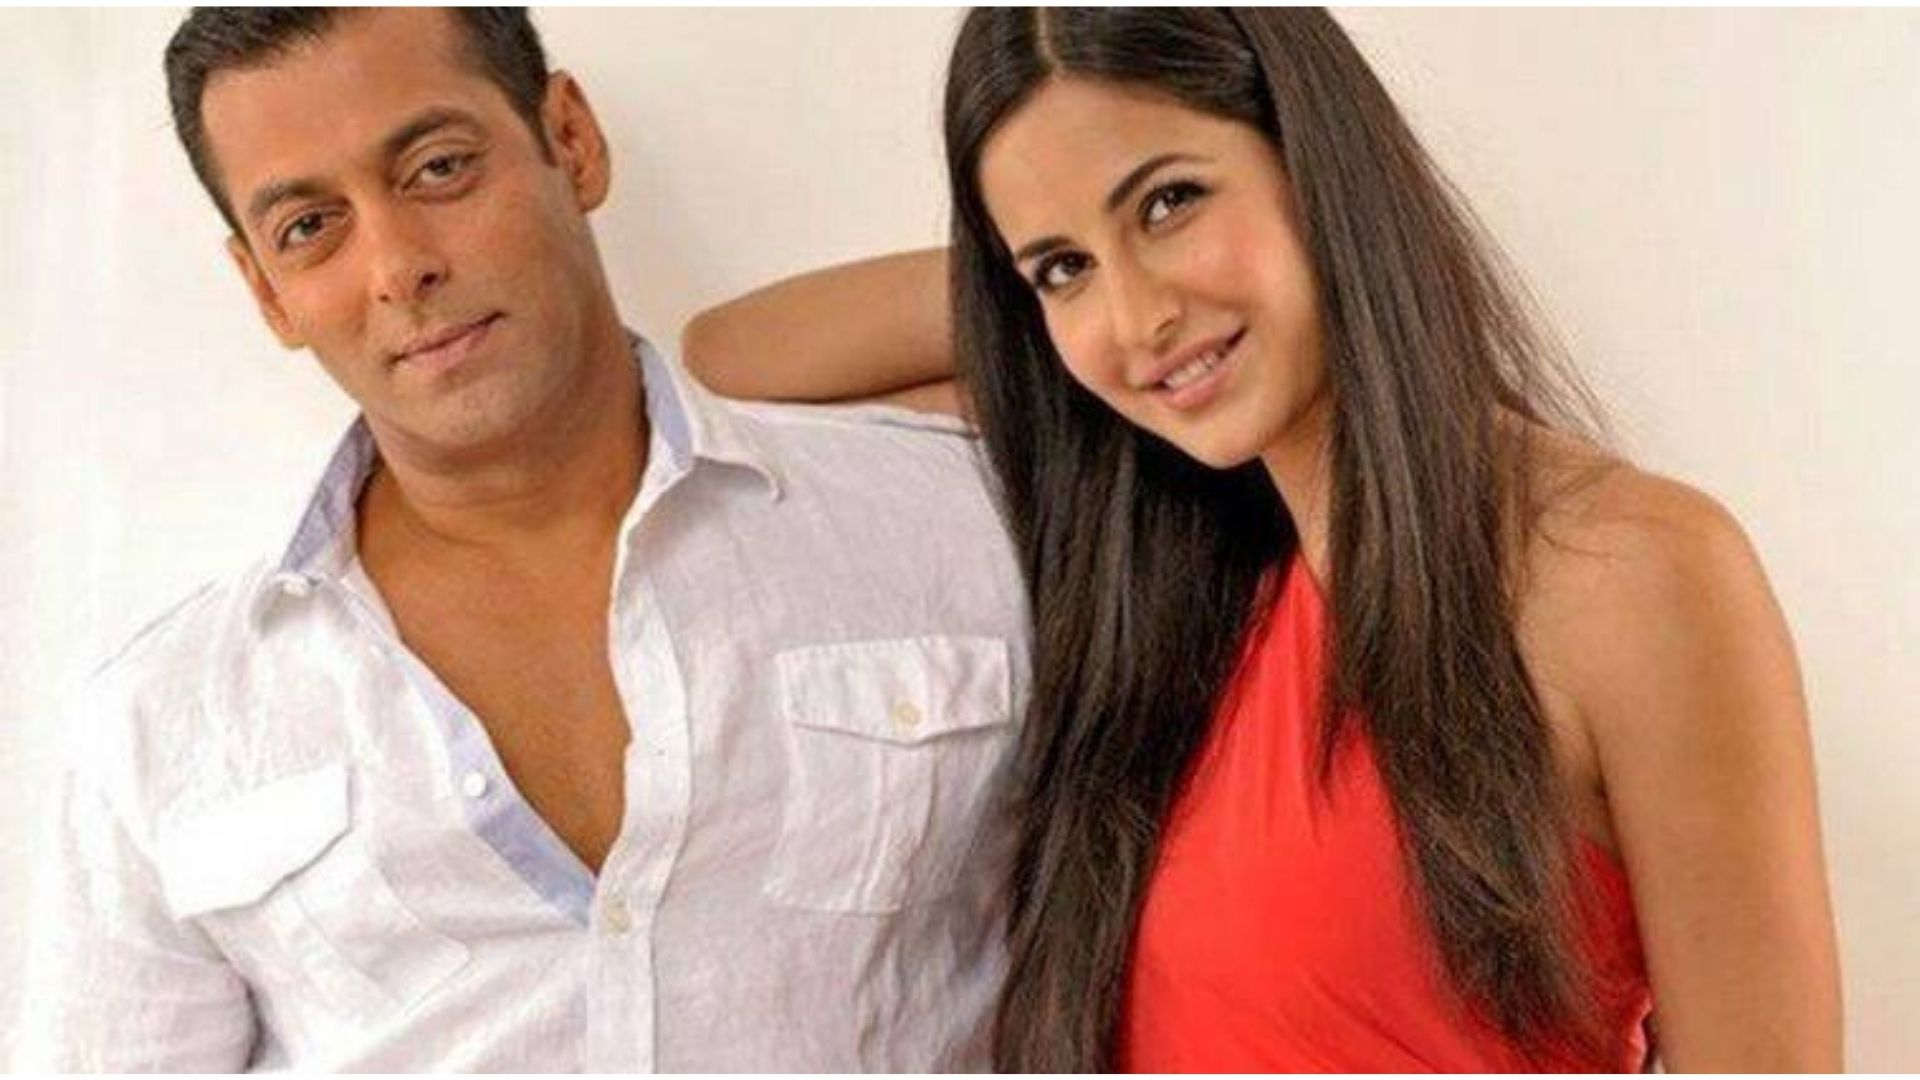 Salman Khan, Katrina Kaif And Others Celebs Who Flaunted Their Love Bites